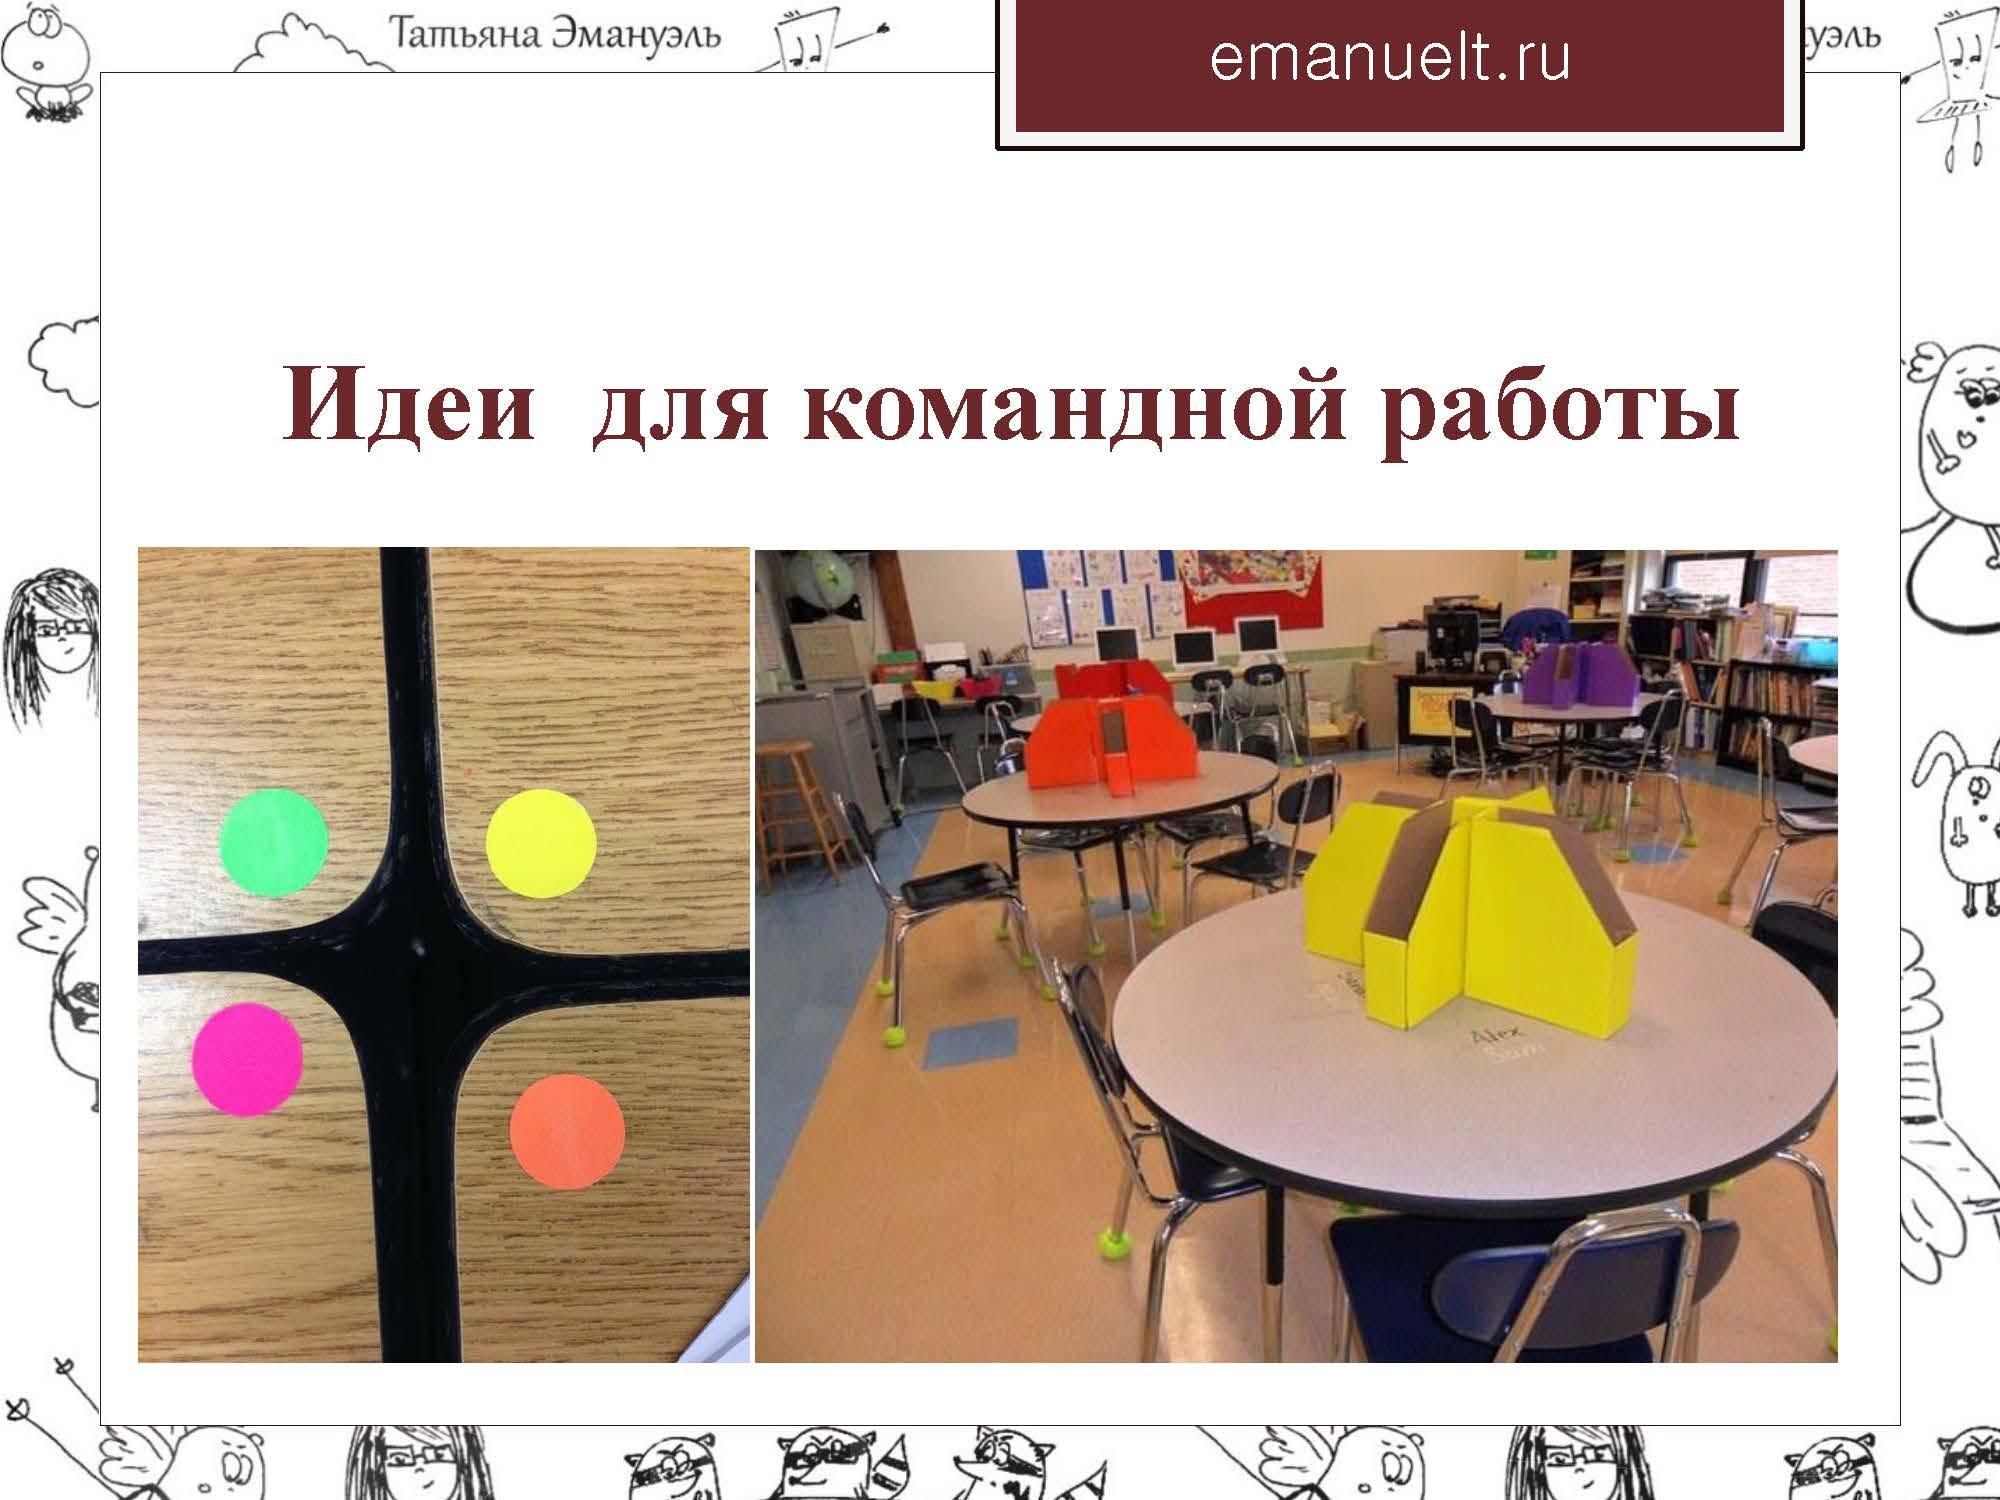 06 февраля эмануэль_Страница_082